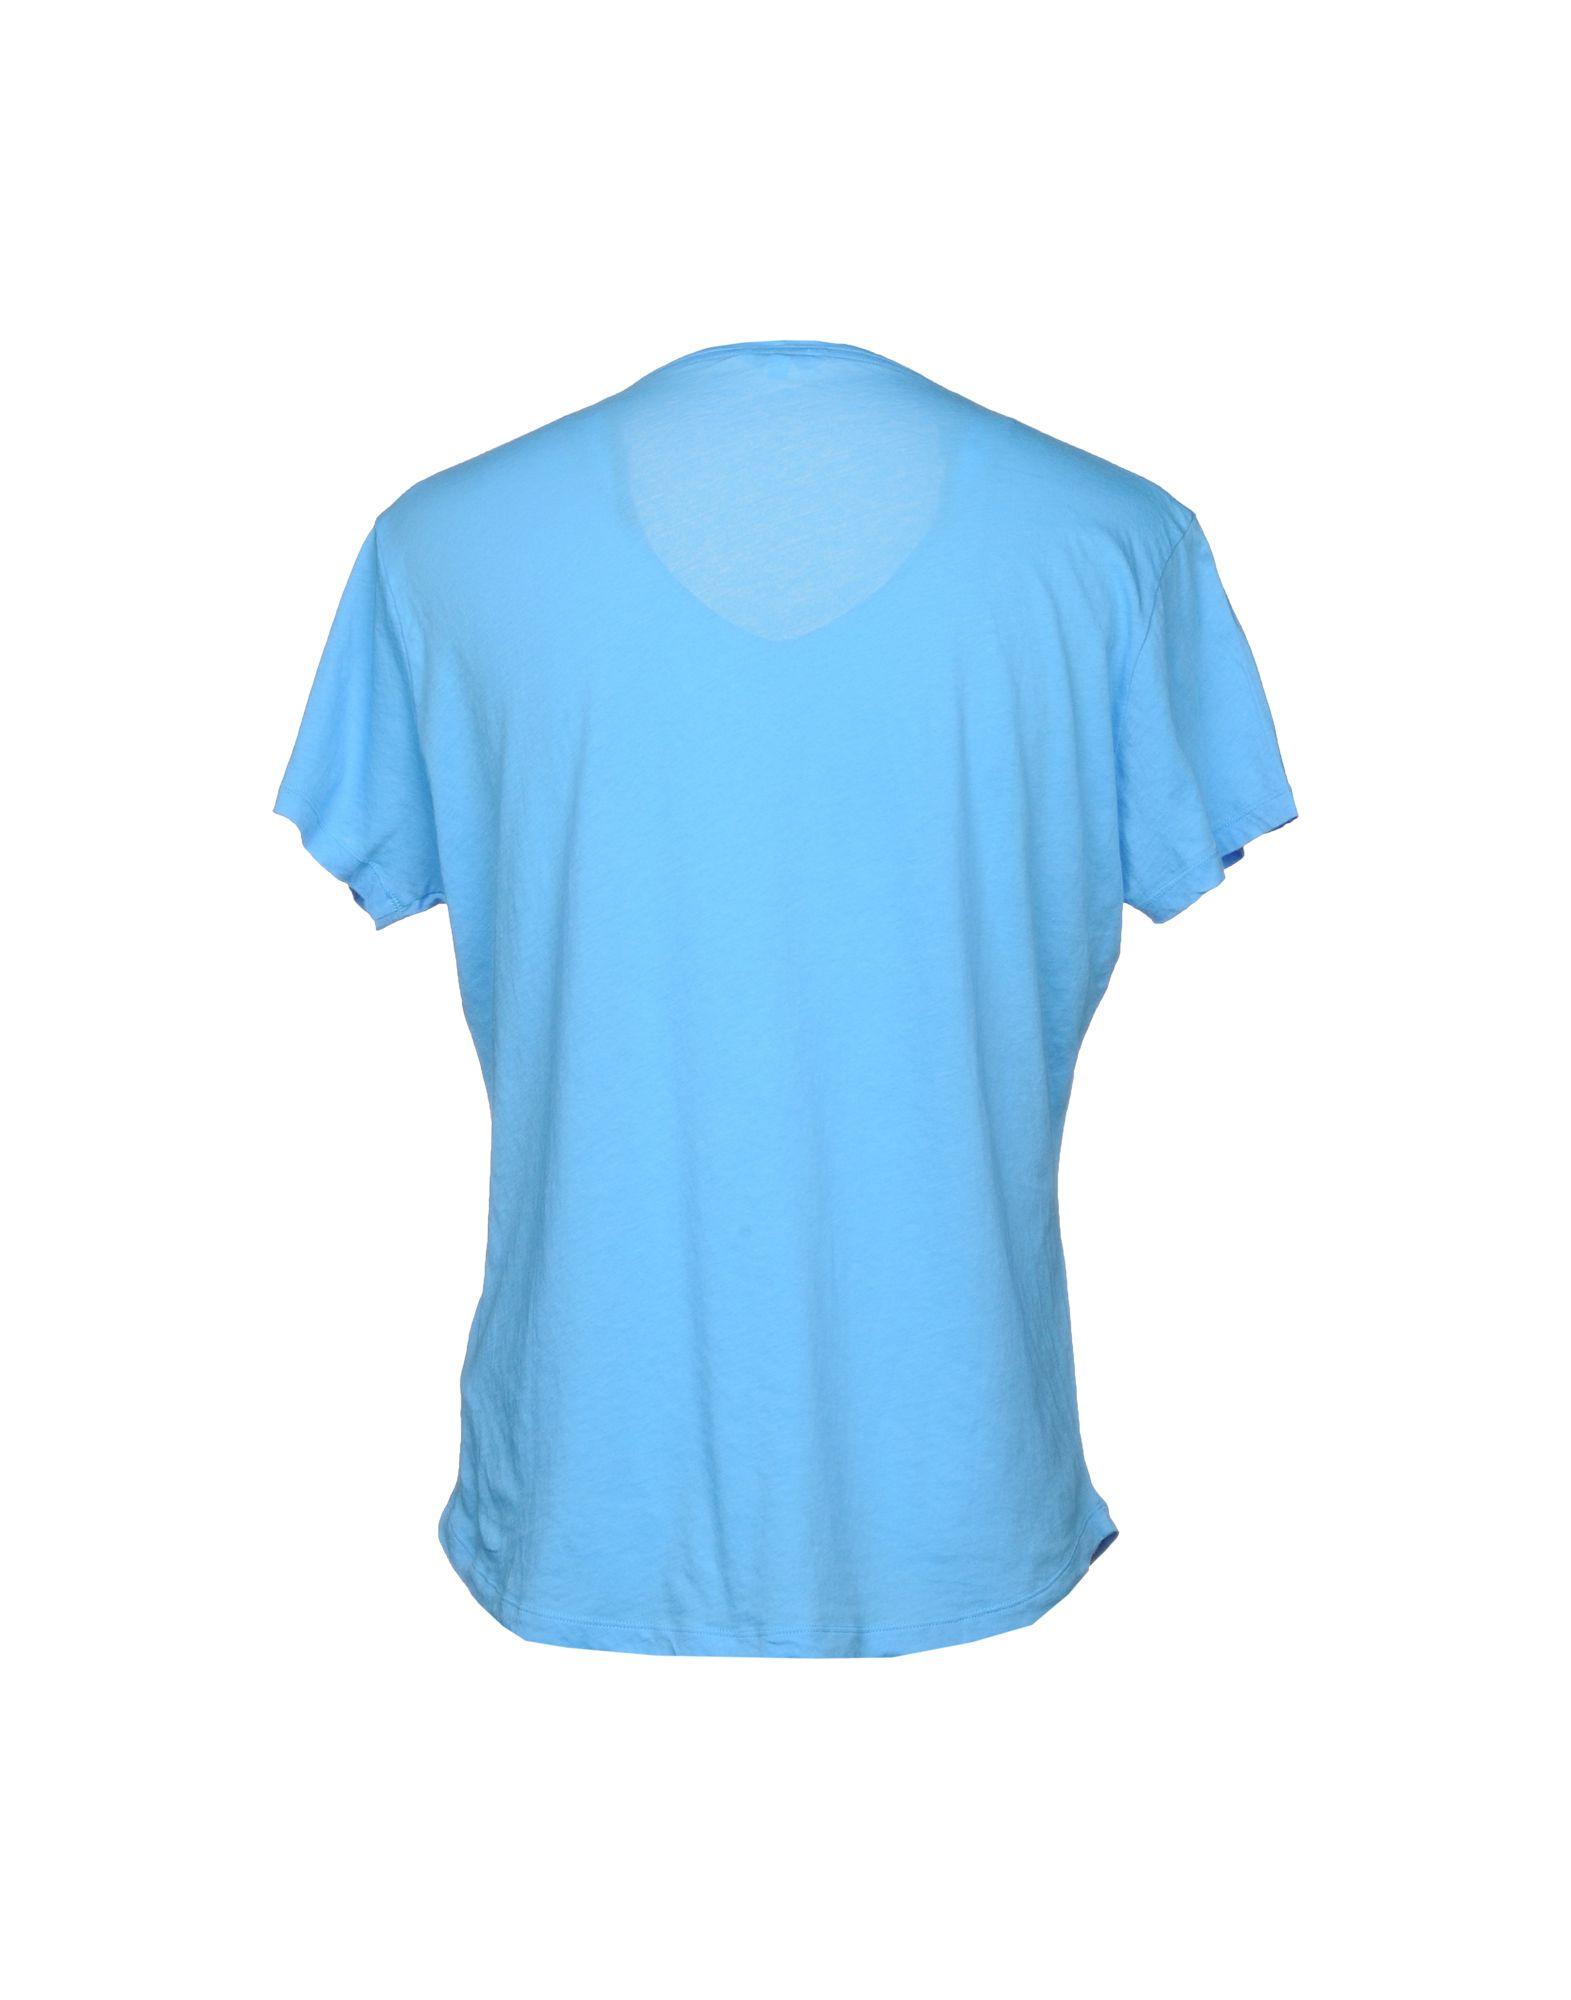 T-Shirt Orlebar marrone Uomo Uomo marrone - 12136870SO 3ff843